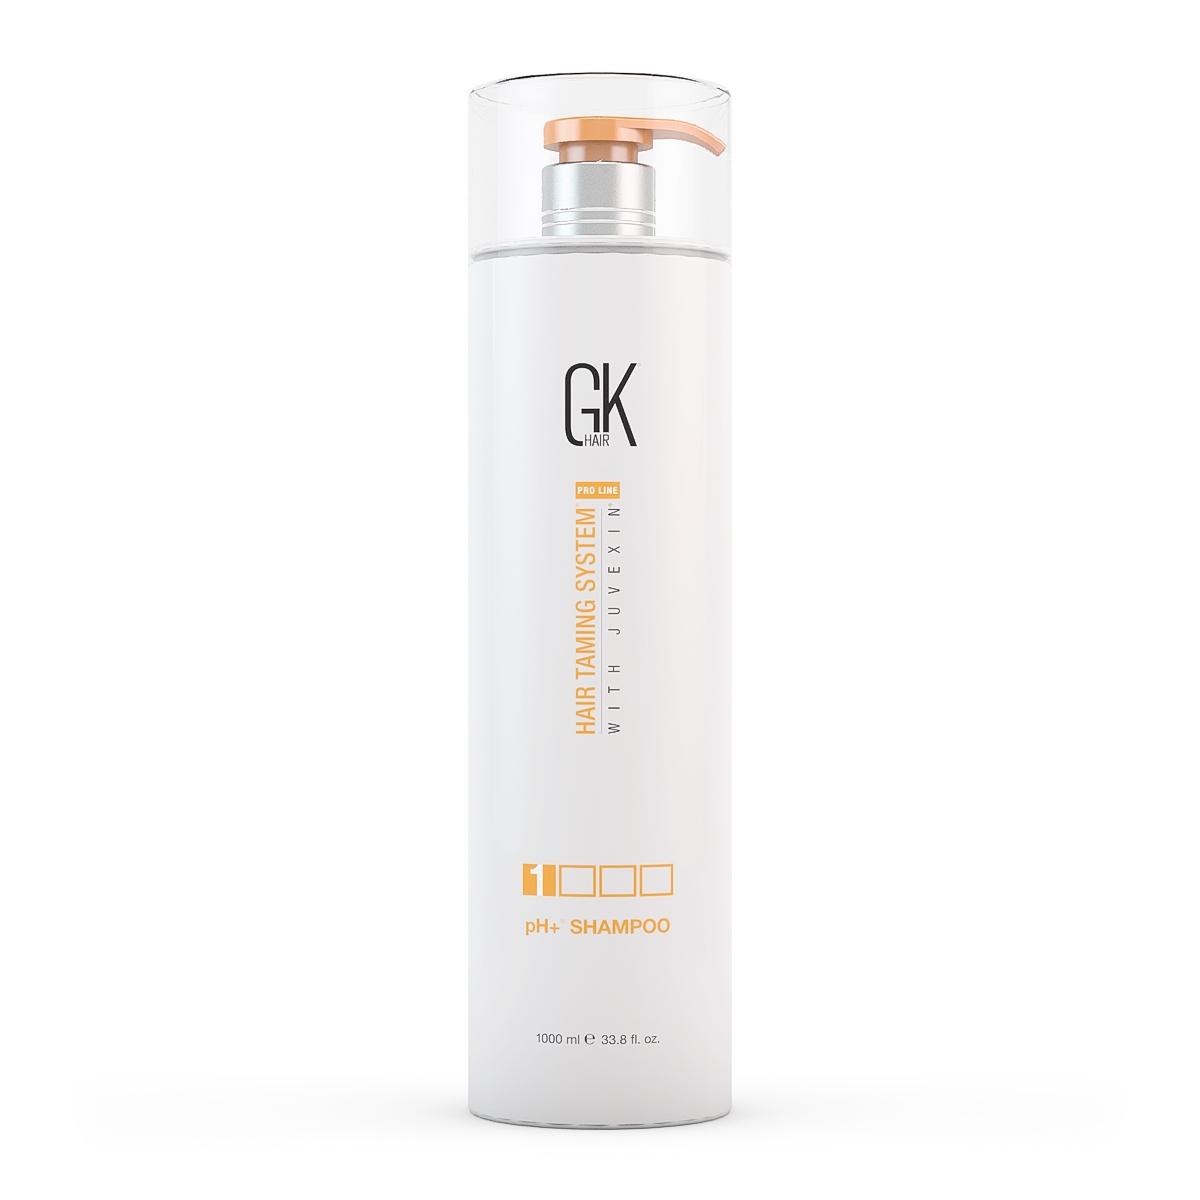 Фото - Global Keratin Очищающий Шампунь Claryfing PH +, 1000 мл шампунь для волос ollin keratin royal treatment 100 мл очищающий и обогащающий с кератином